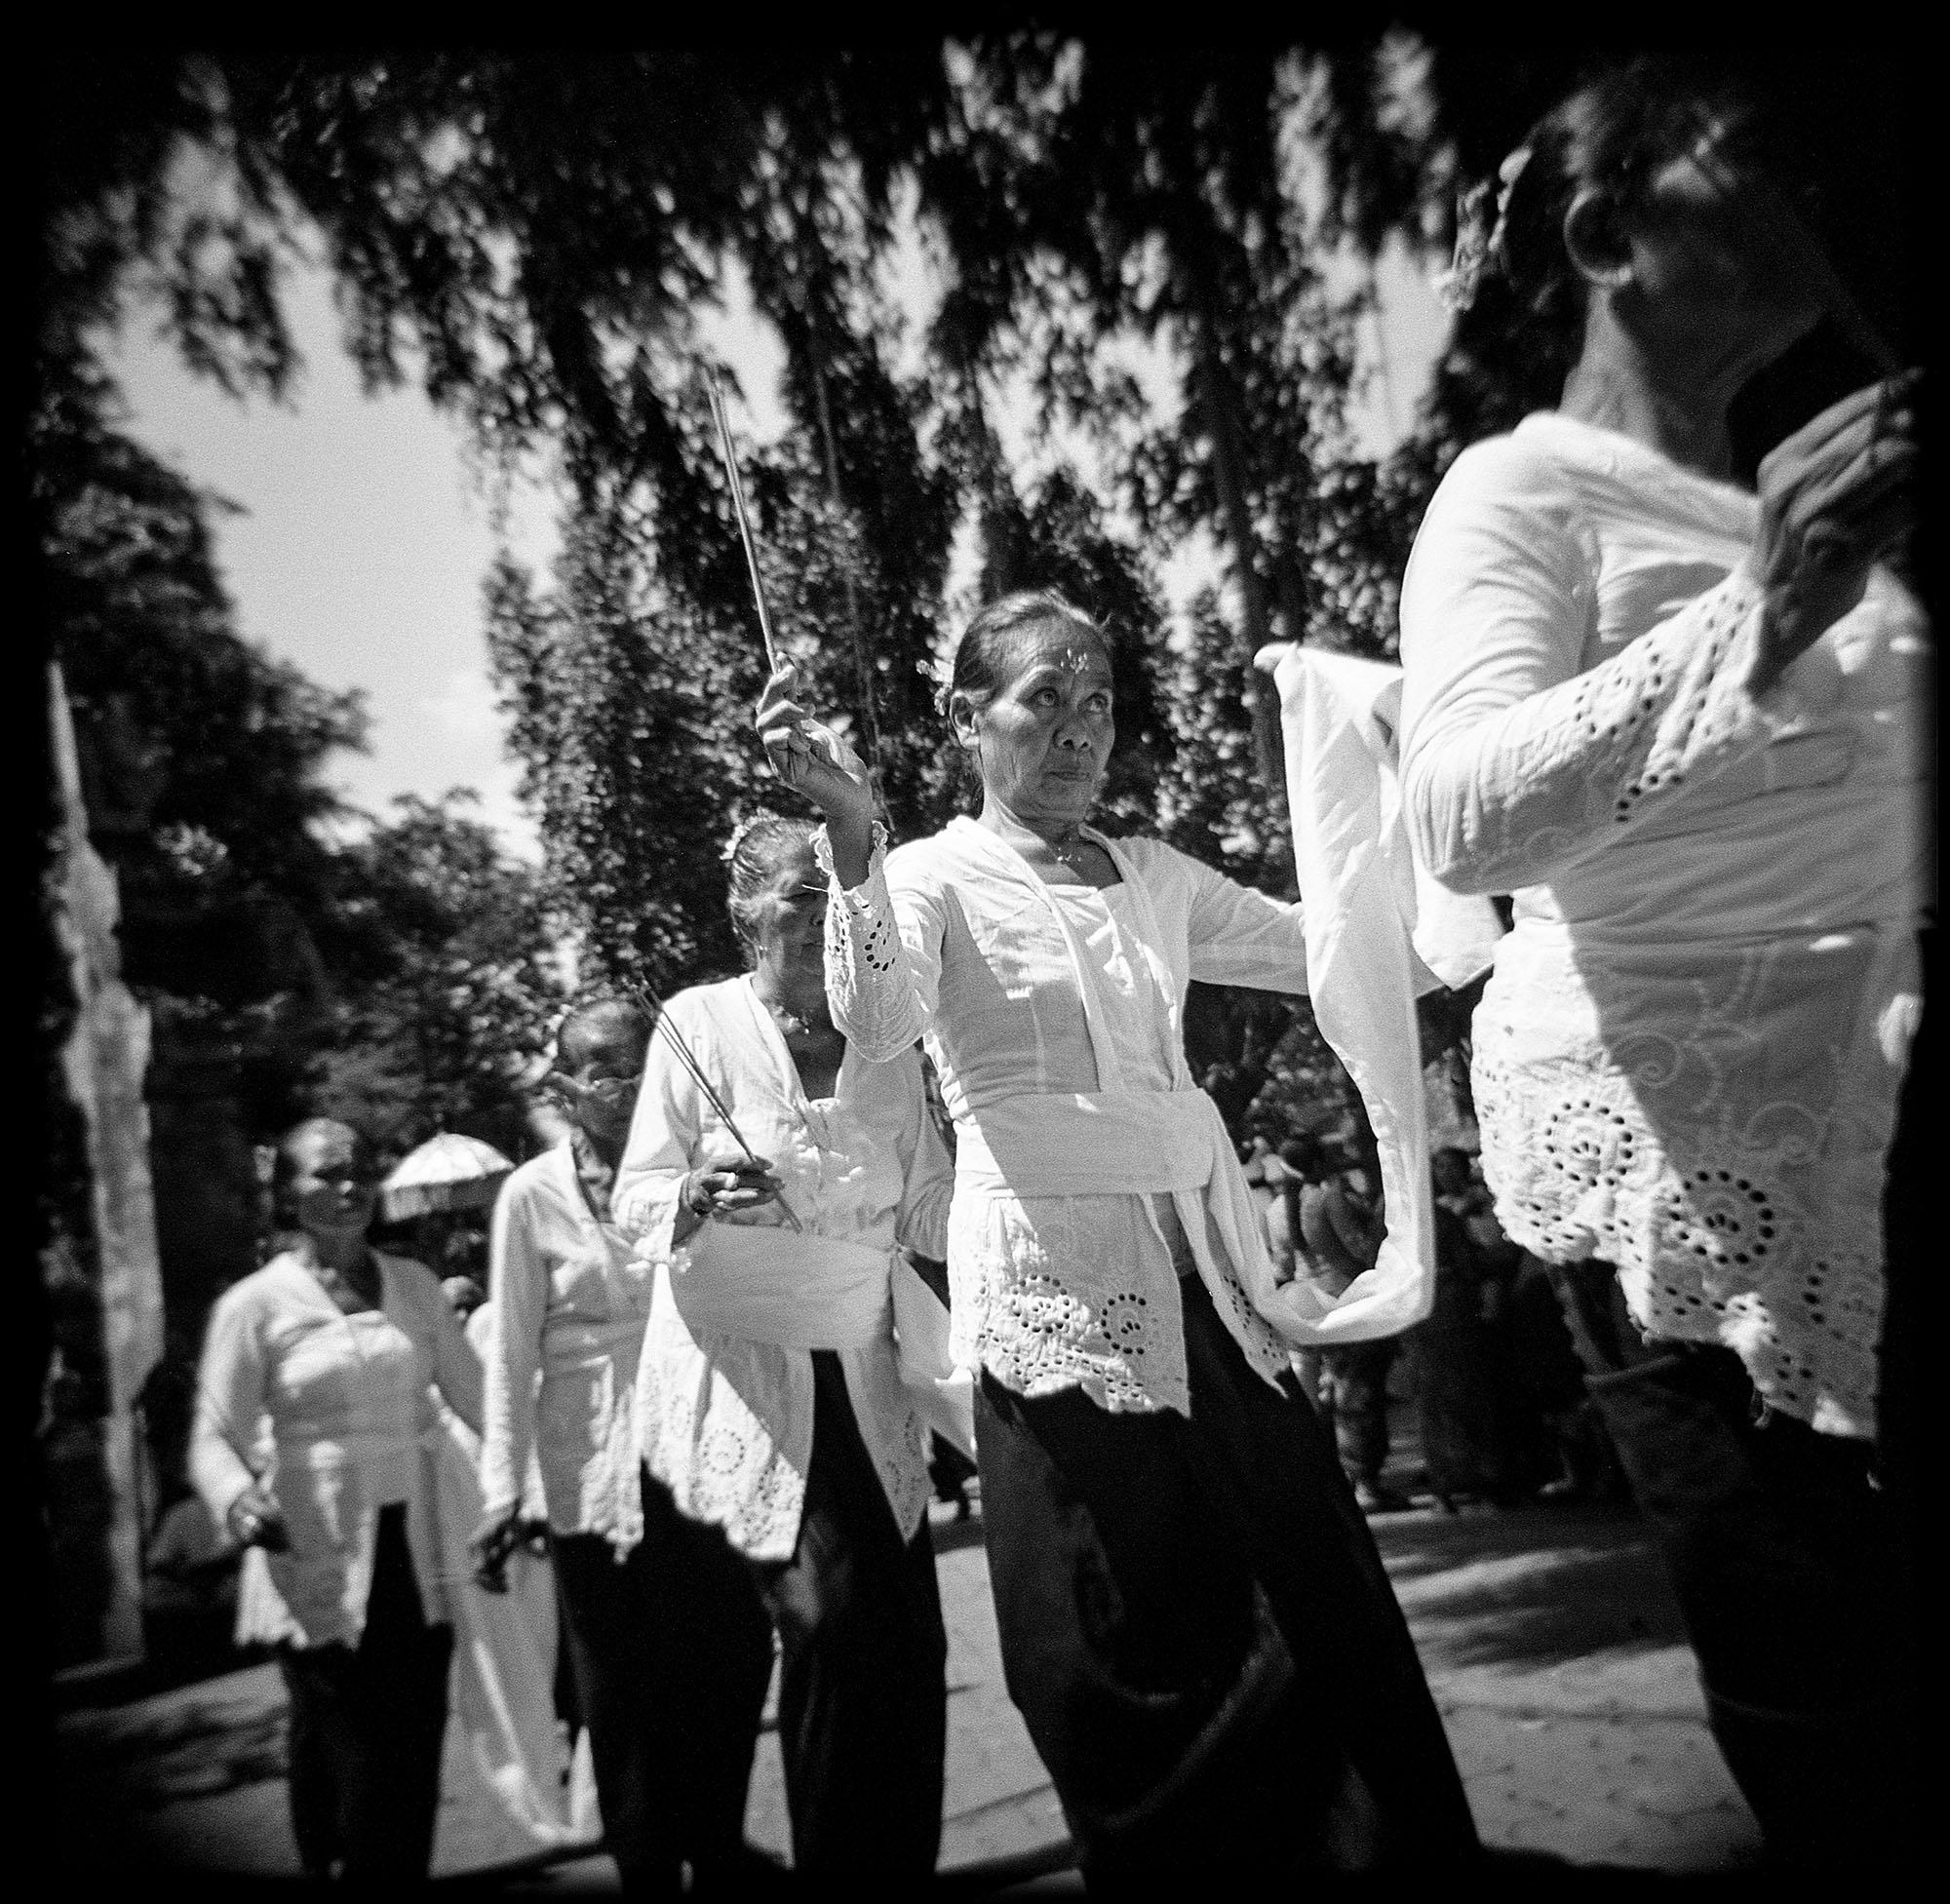 WebSP_methapisic spirituality_AgungParameswara_003.JPG